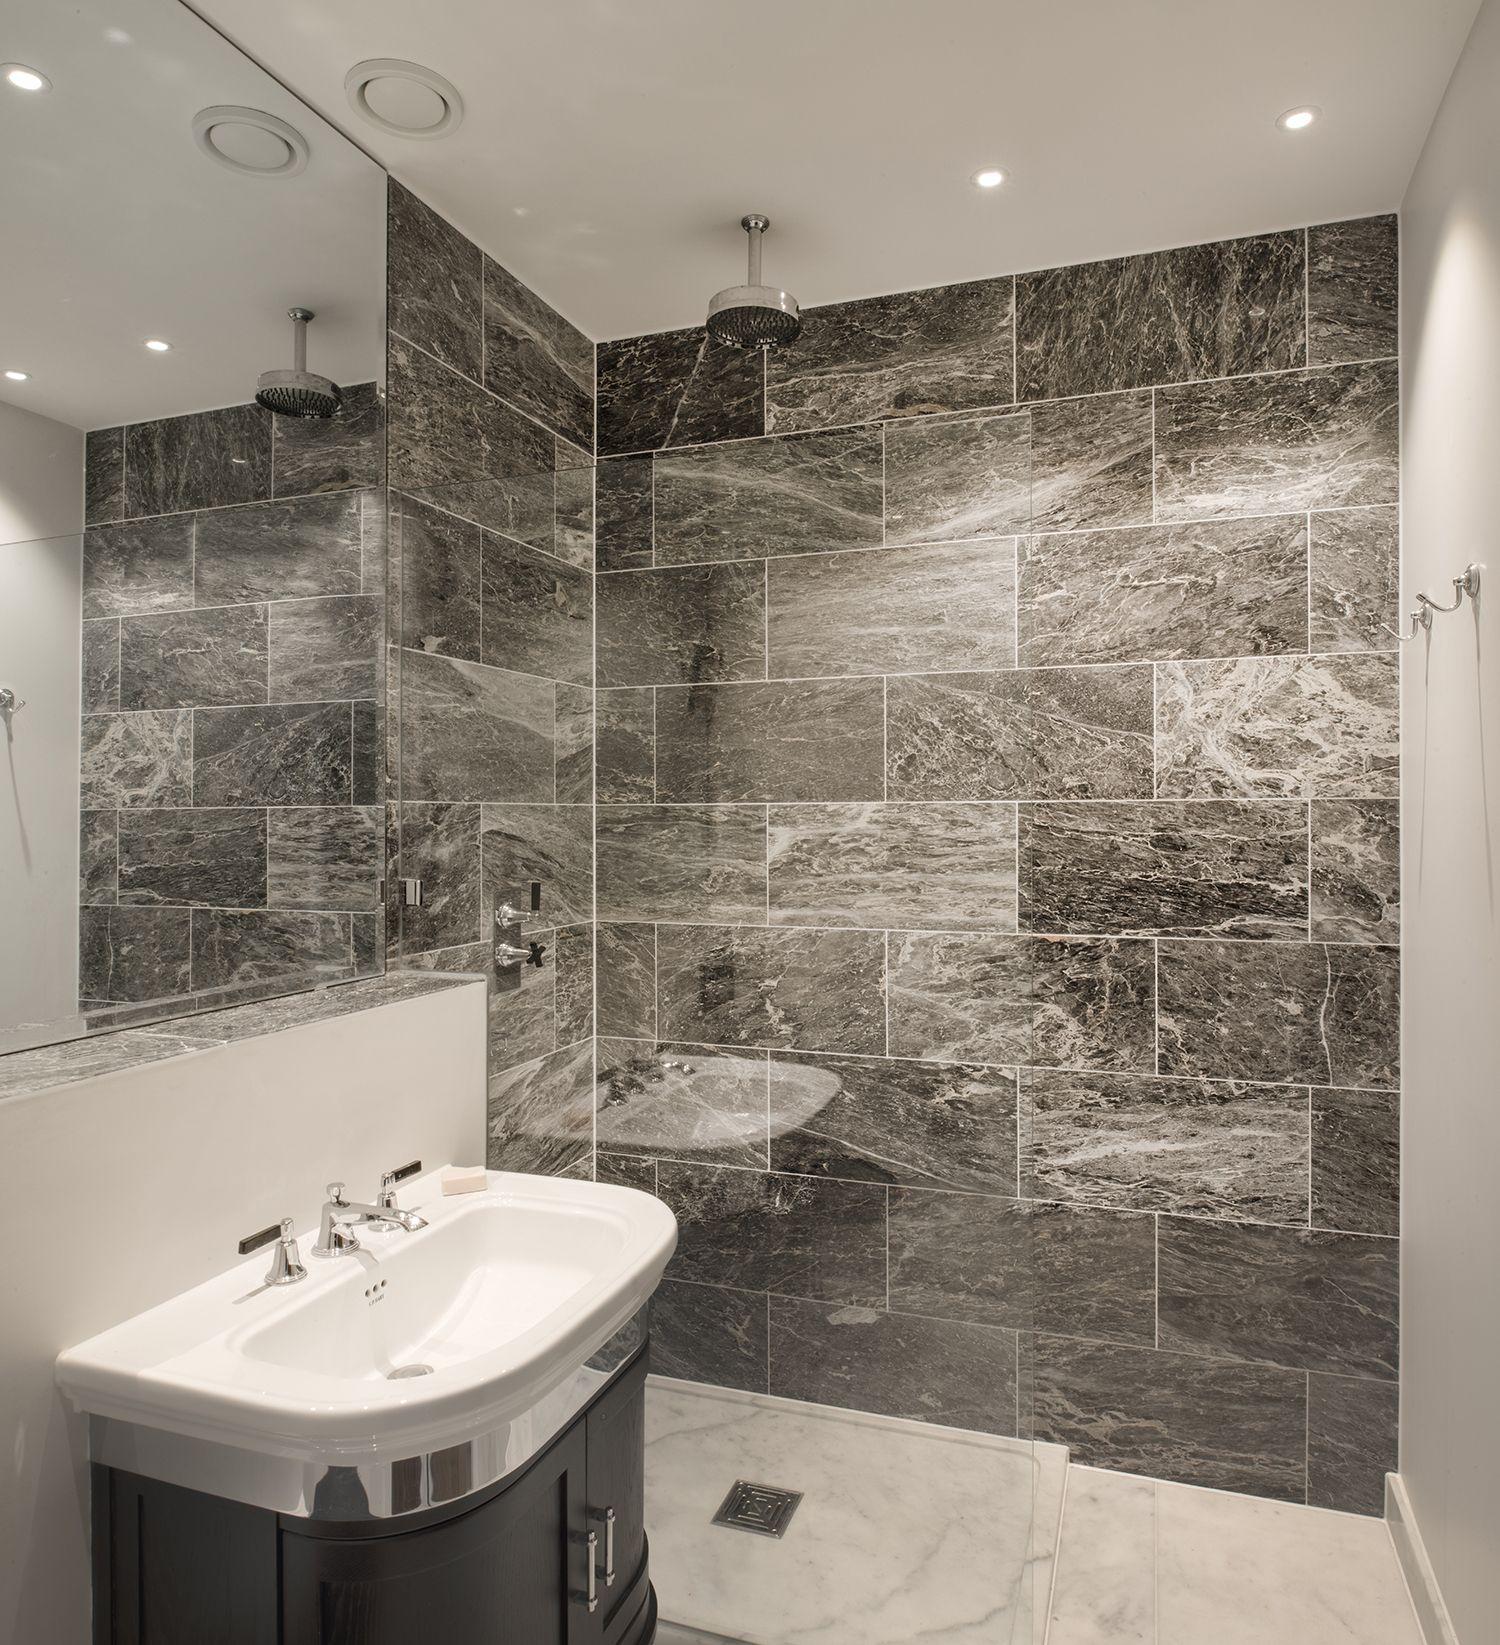 Basement shower room as part of this larger basement